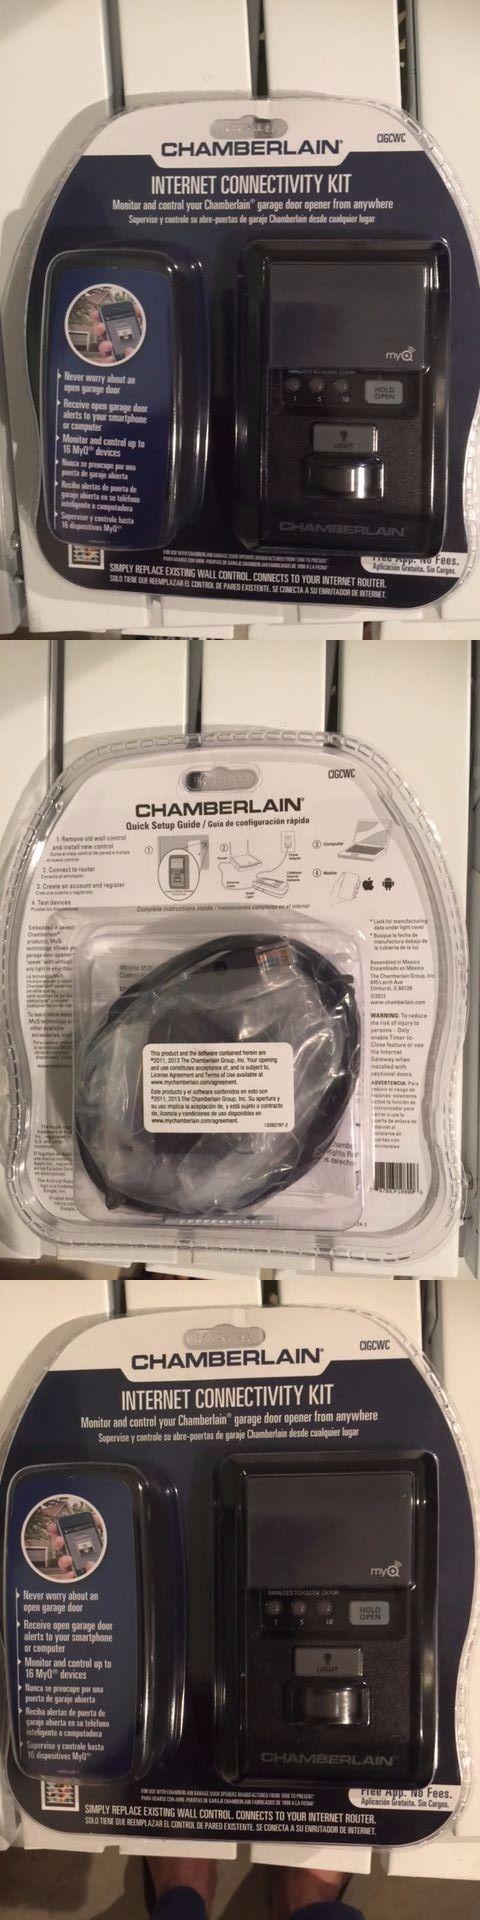 Garage Door Remotes 85899: Chamberlain Cigcwc Smartphone Connectivity Kit For Chamberlain Garage Door Open -> BUY IT NOW ONLY: $79 on eBay!